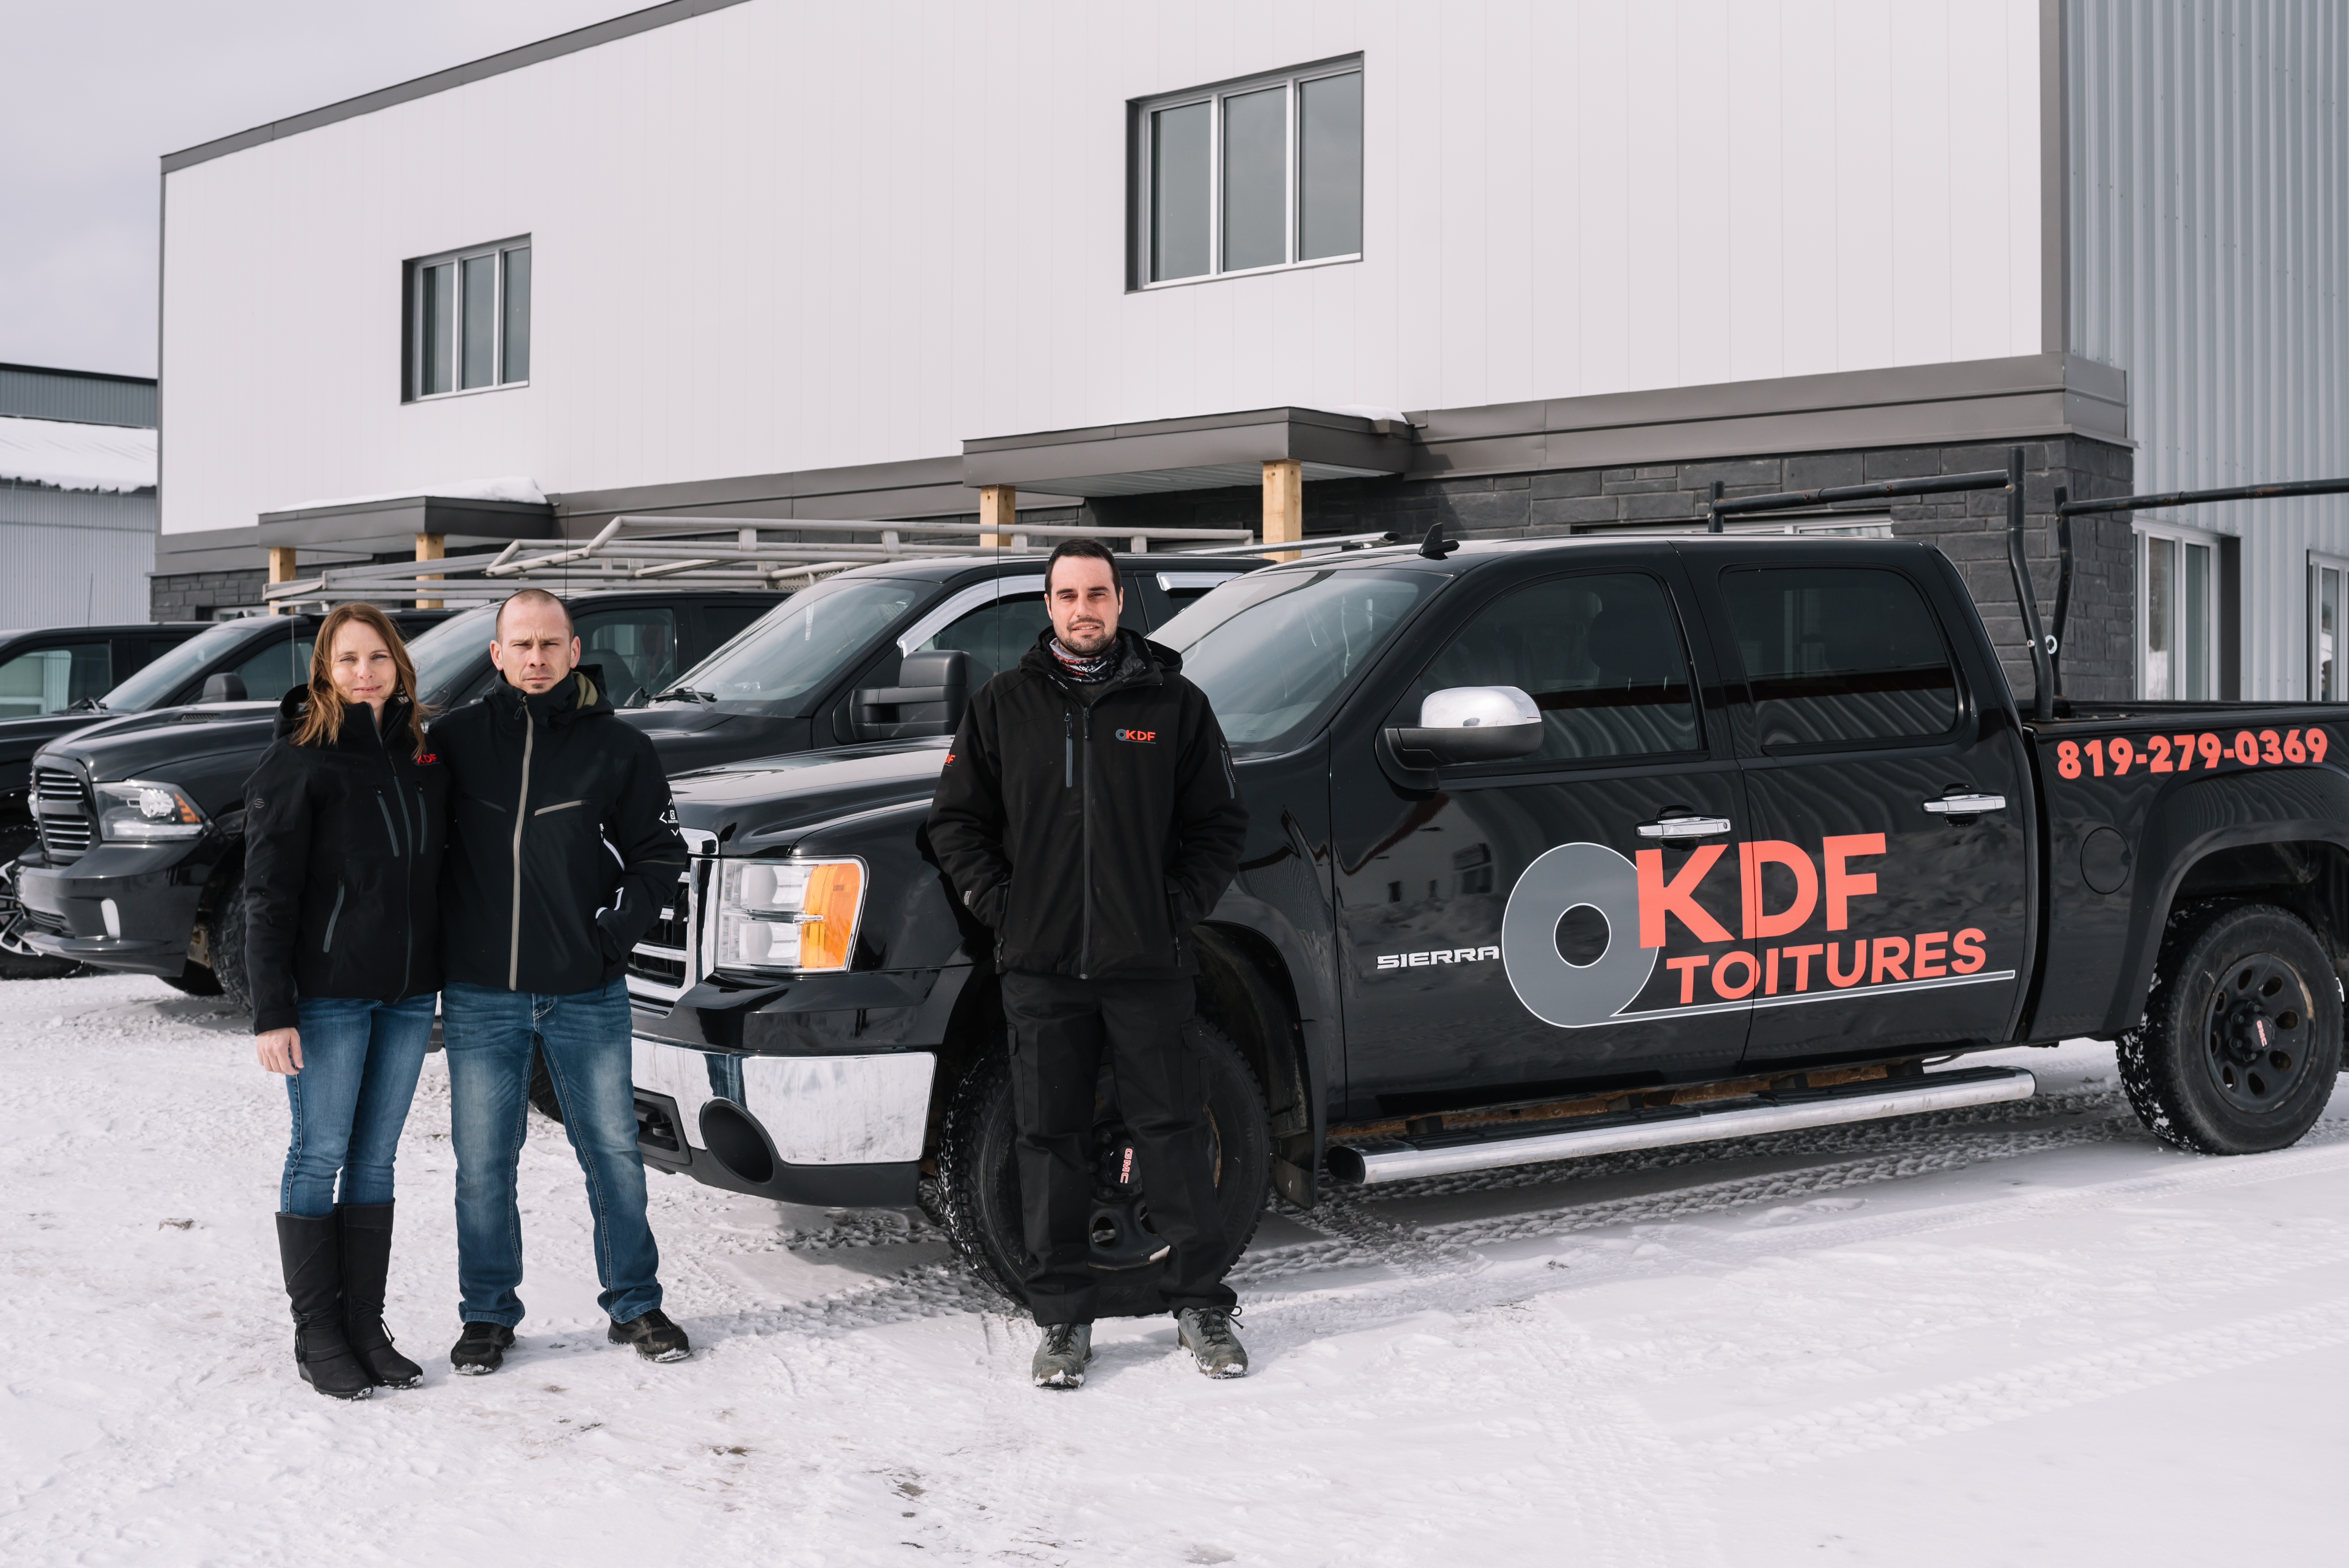 KDF Toitures